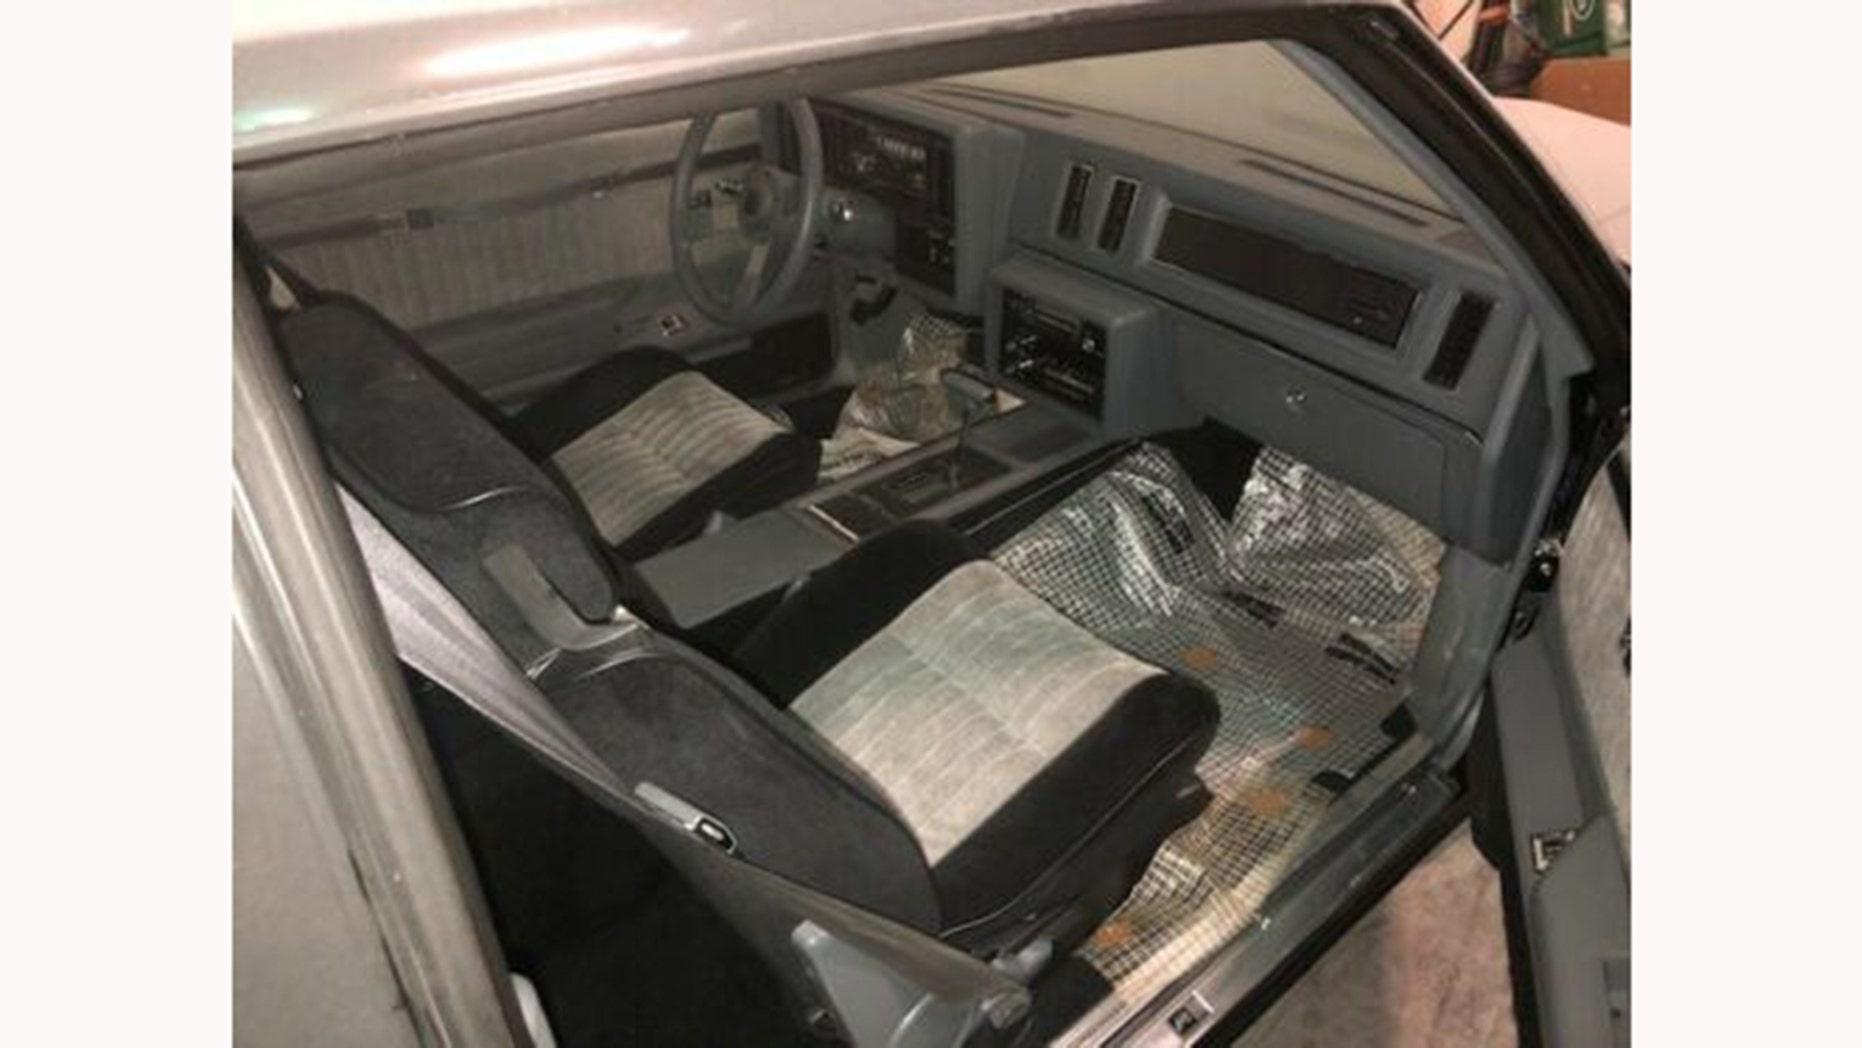 1987 Buick Grand National interior